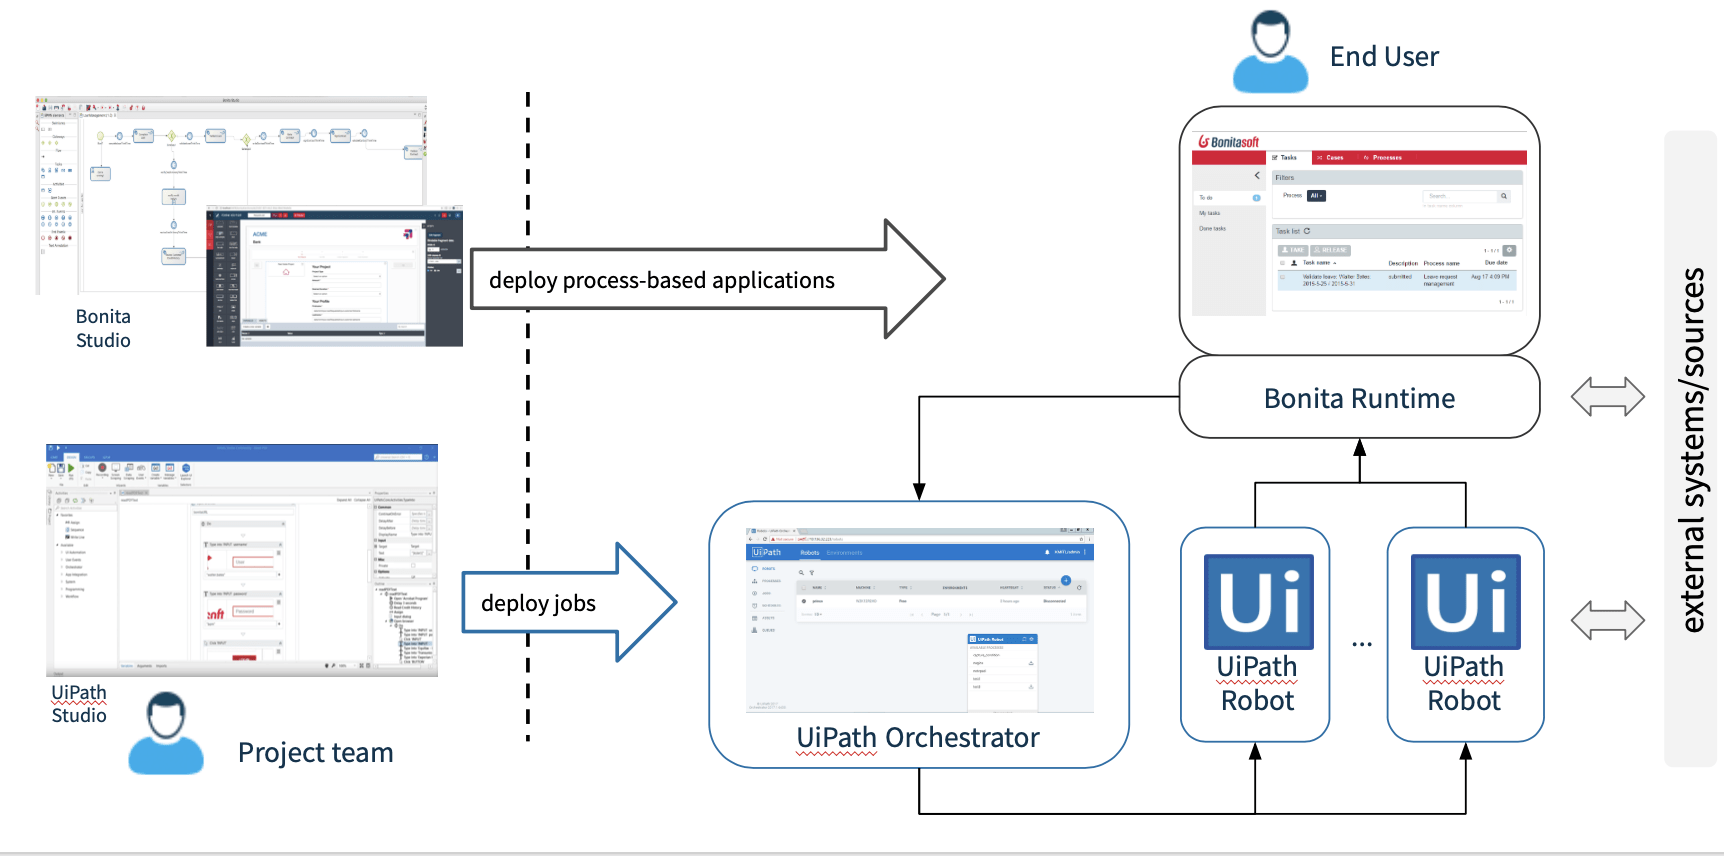 Idevnews | Bonitasoft, UiPath Seamlessly Integrate BPM & RPA